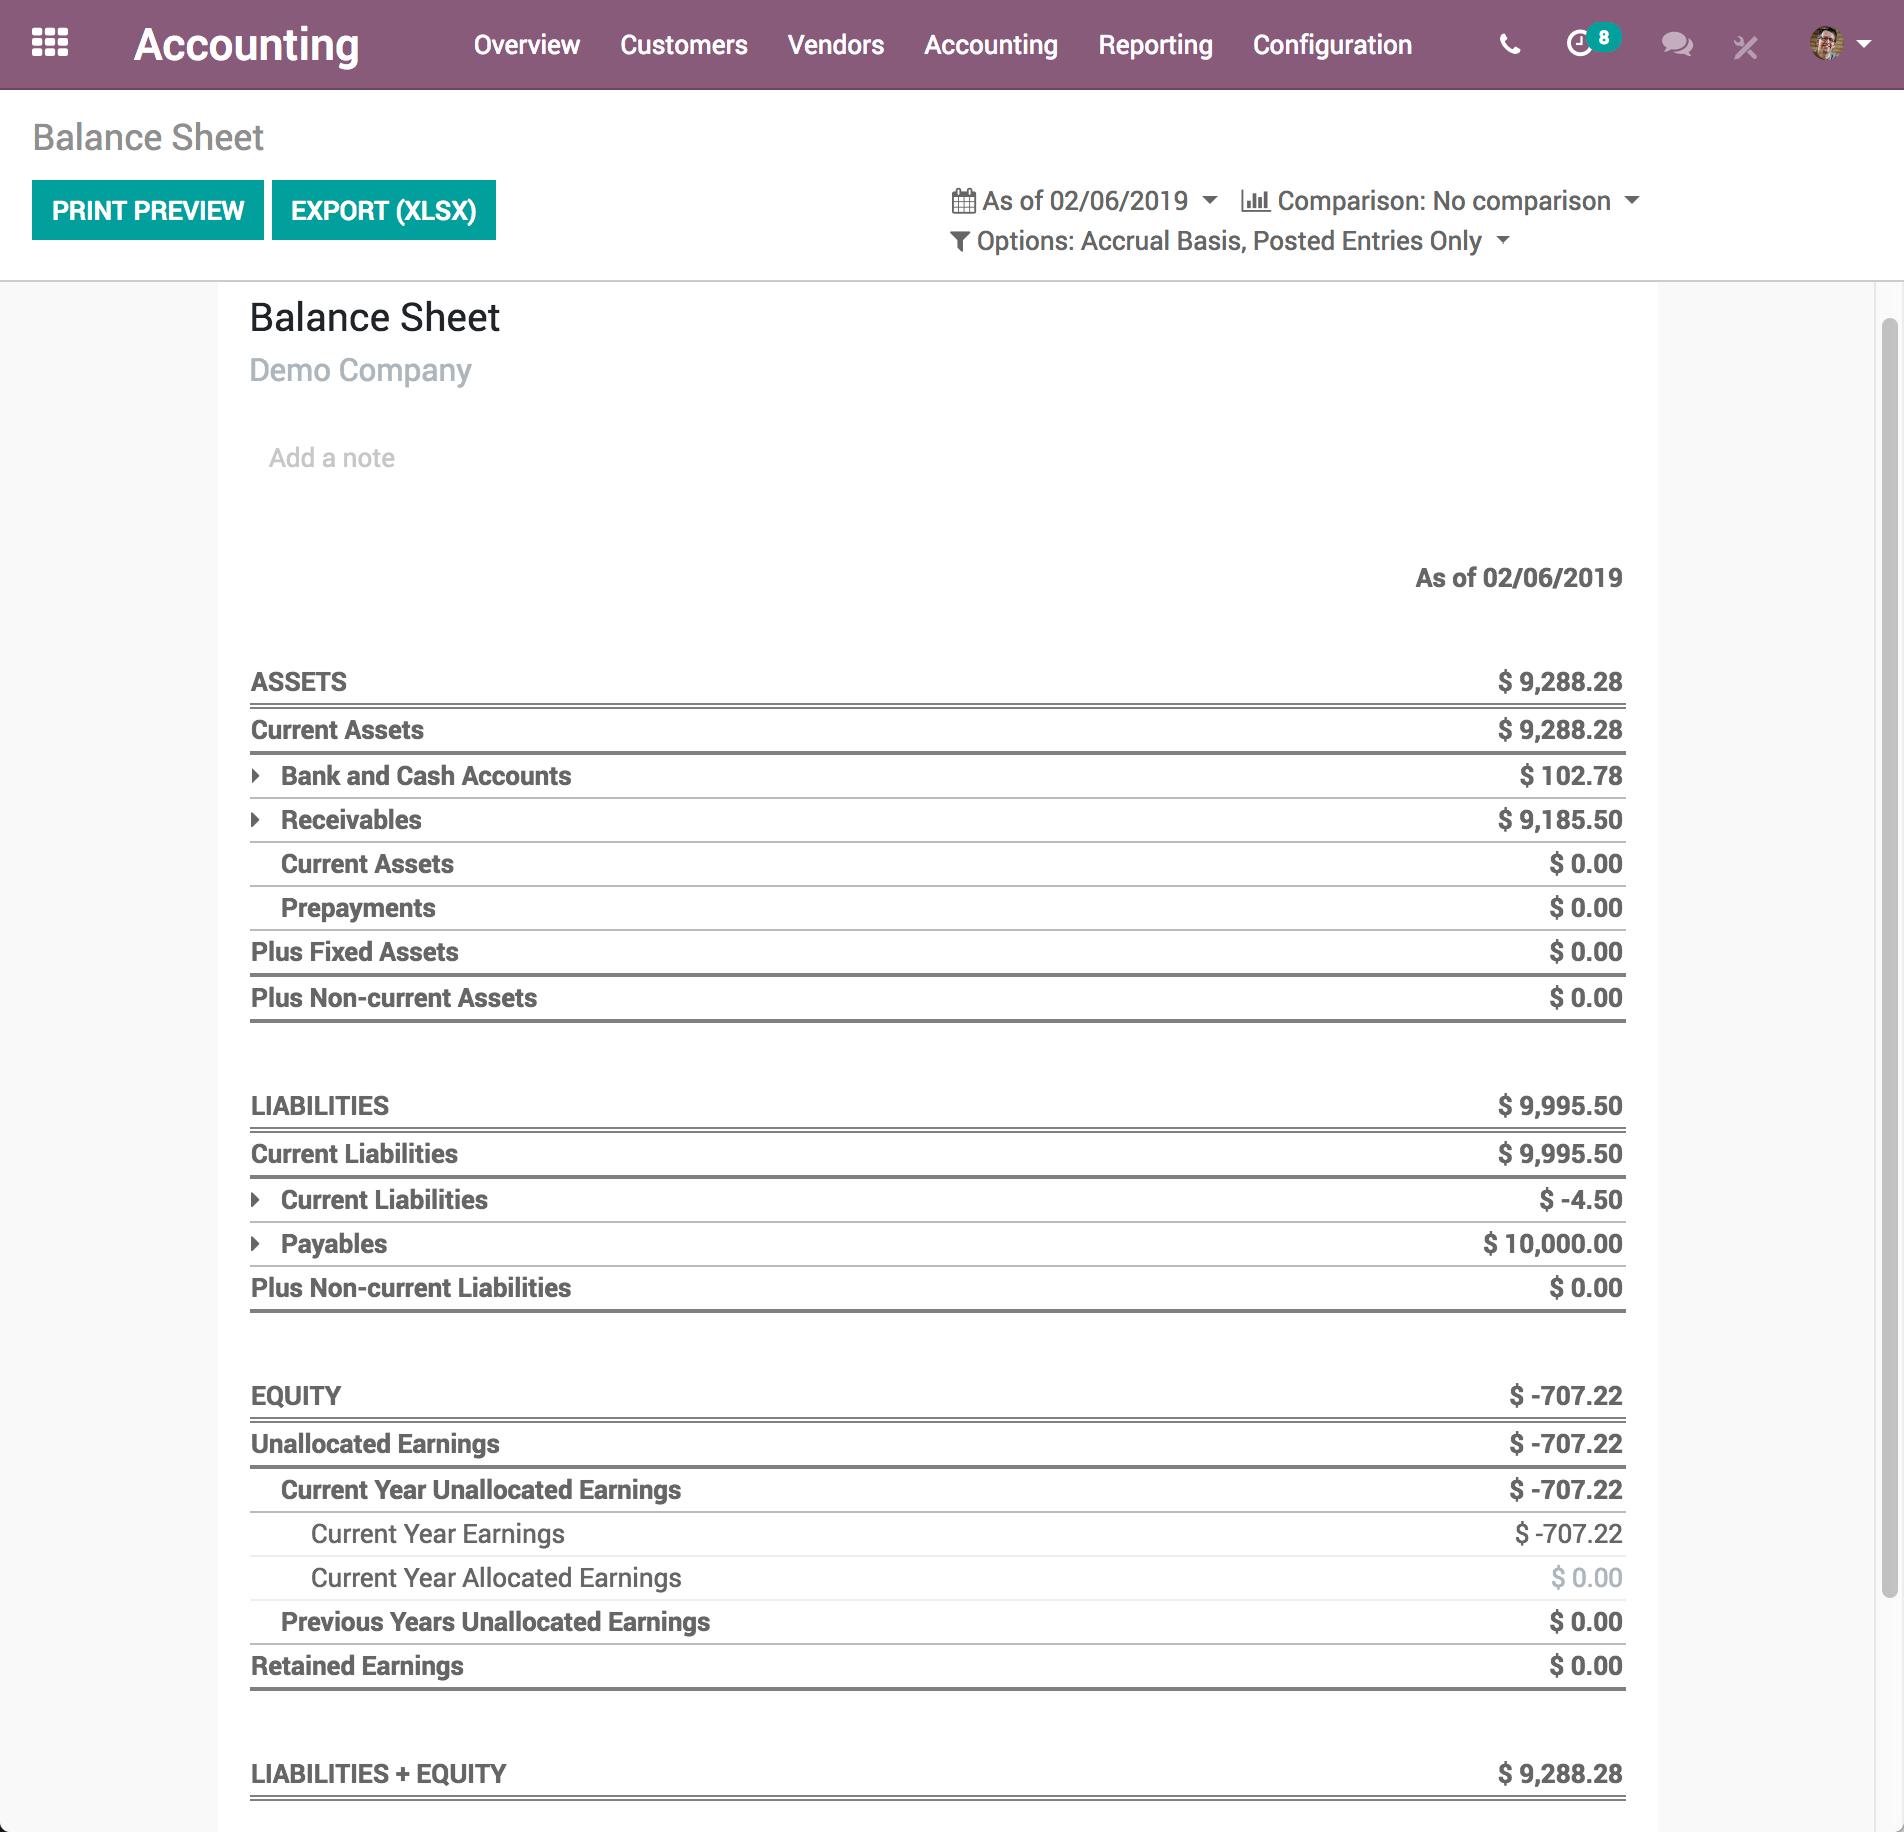 Odoo Accounting - Balance Sheet